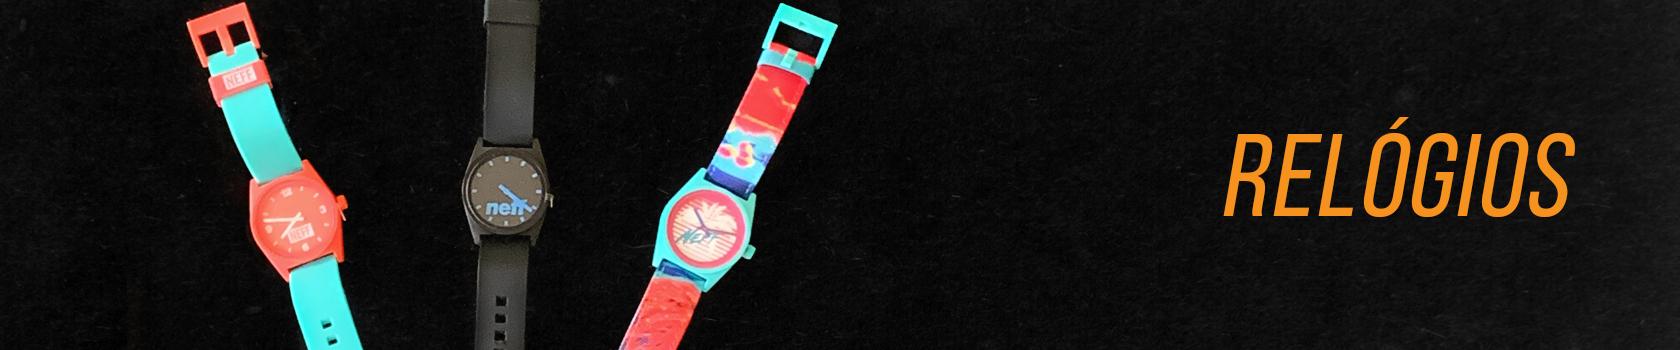 Cat - Acessórios > Relógios